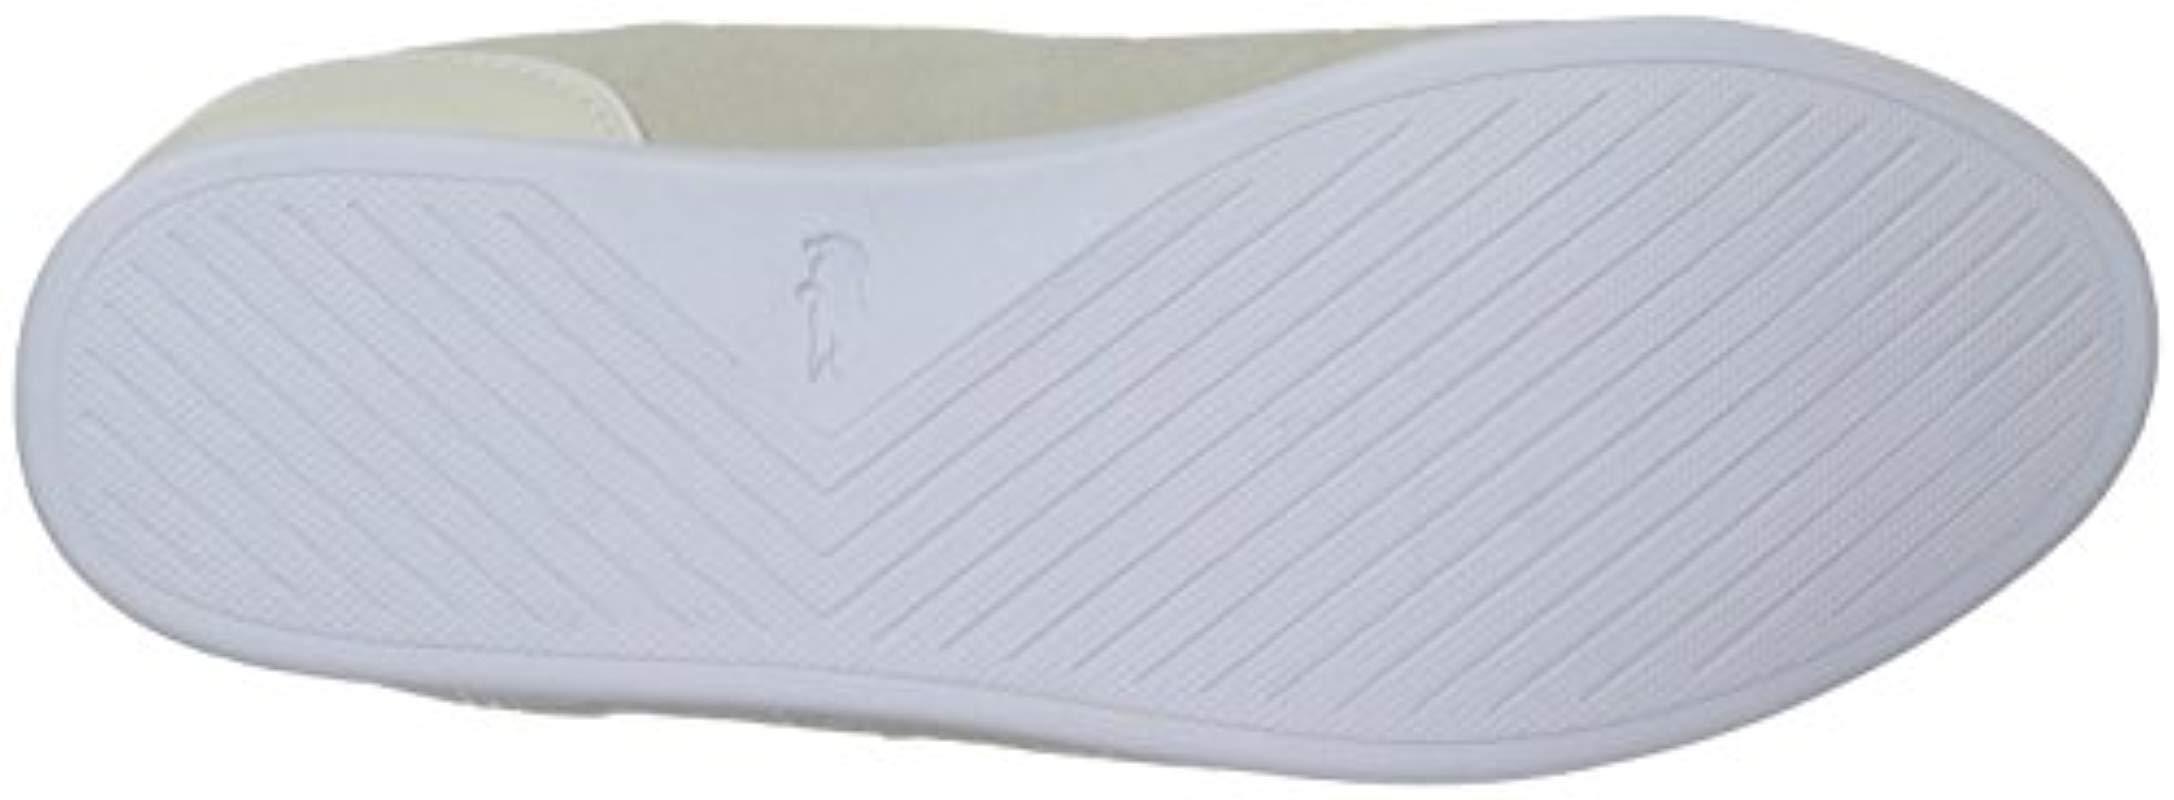 dac4c2580 Lacoste - White Rey Lace Sneaker - Lyst. View fullscreen